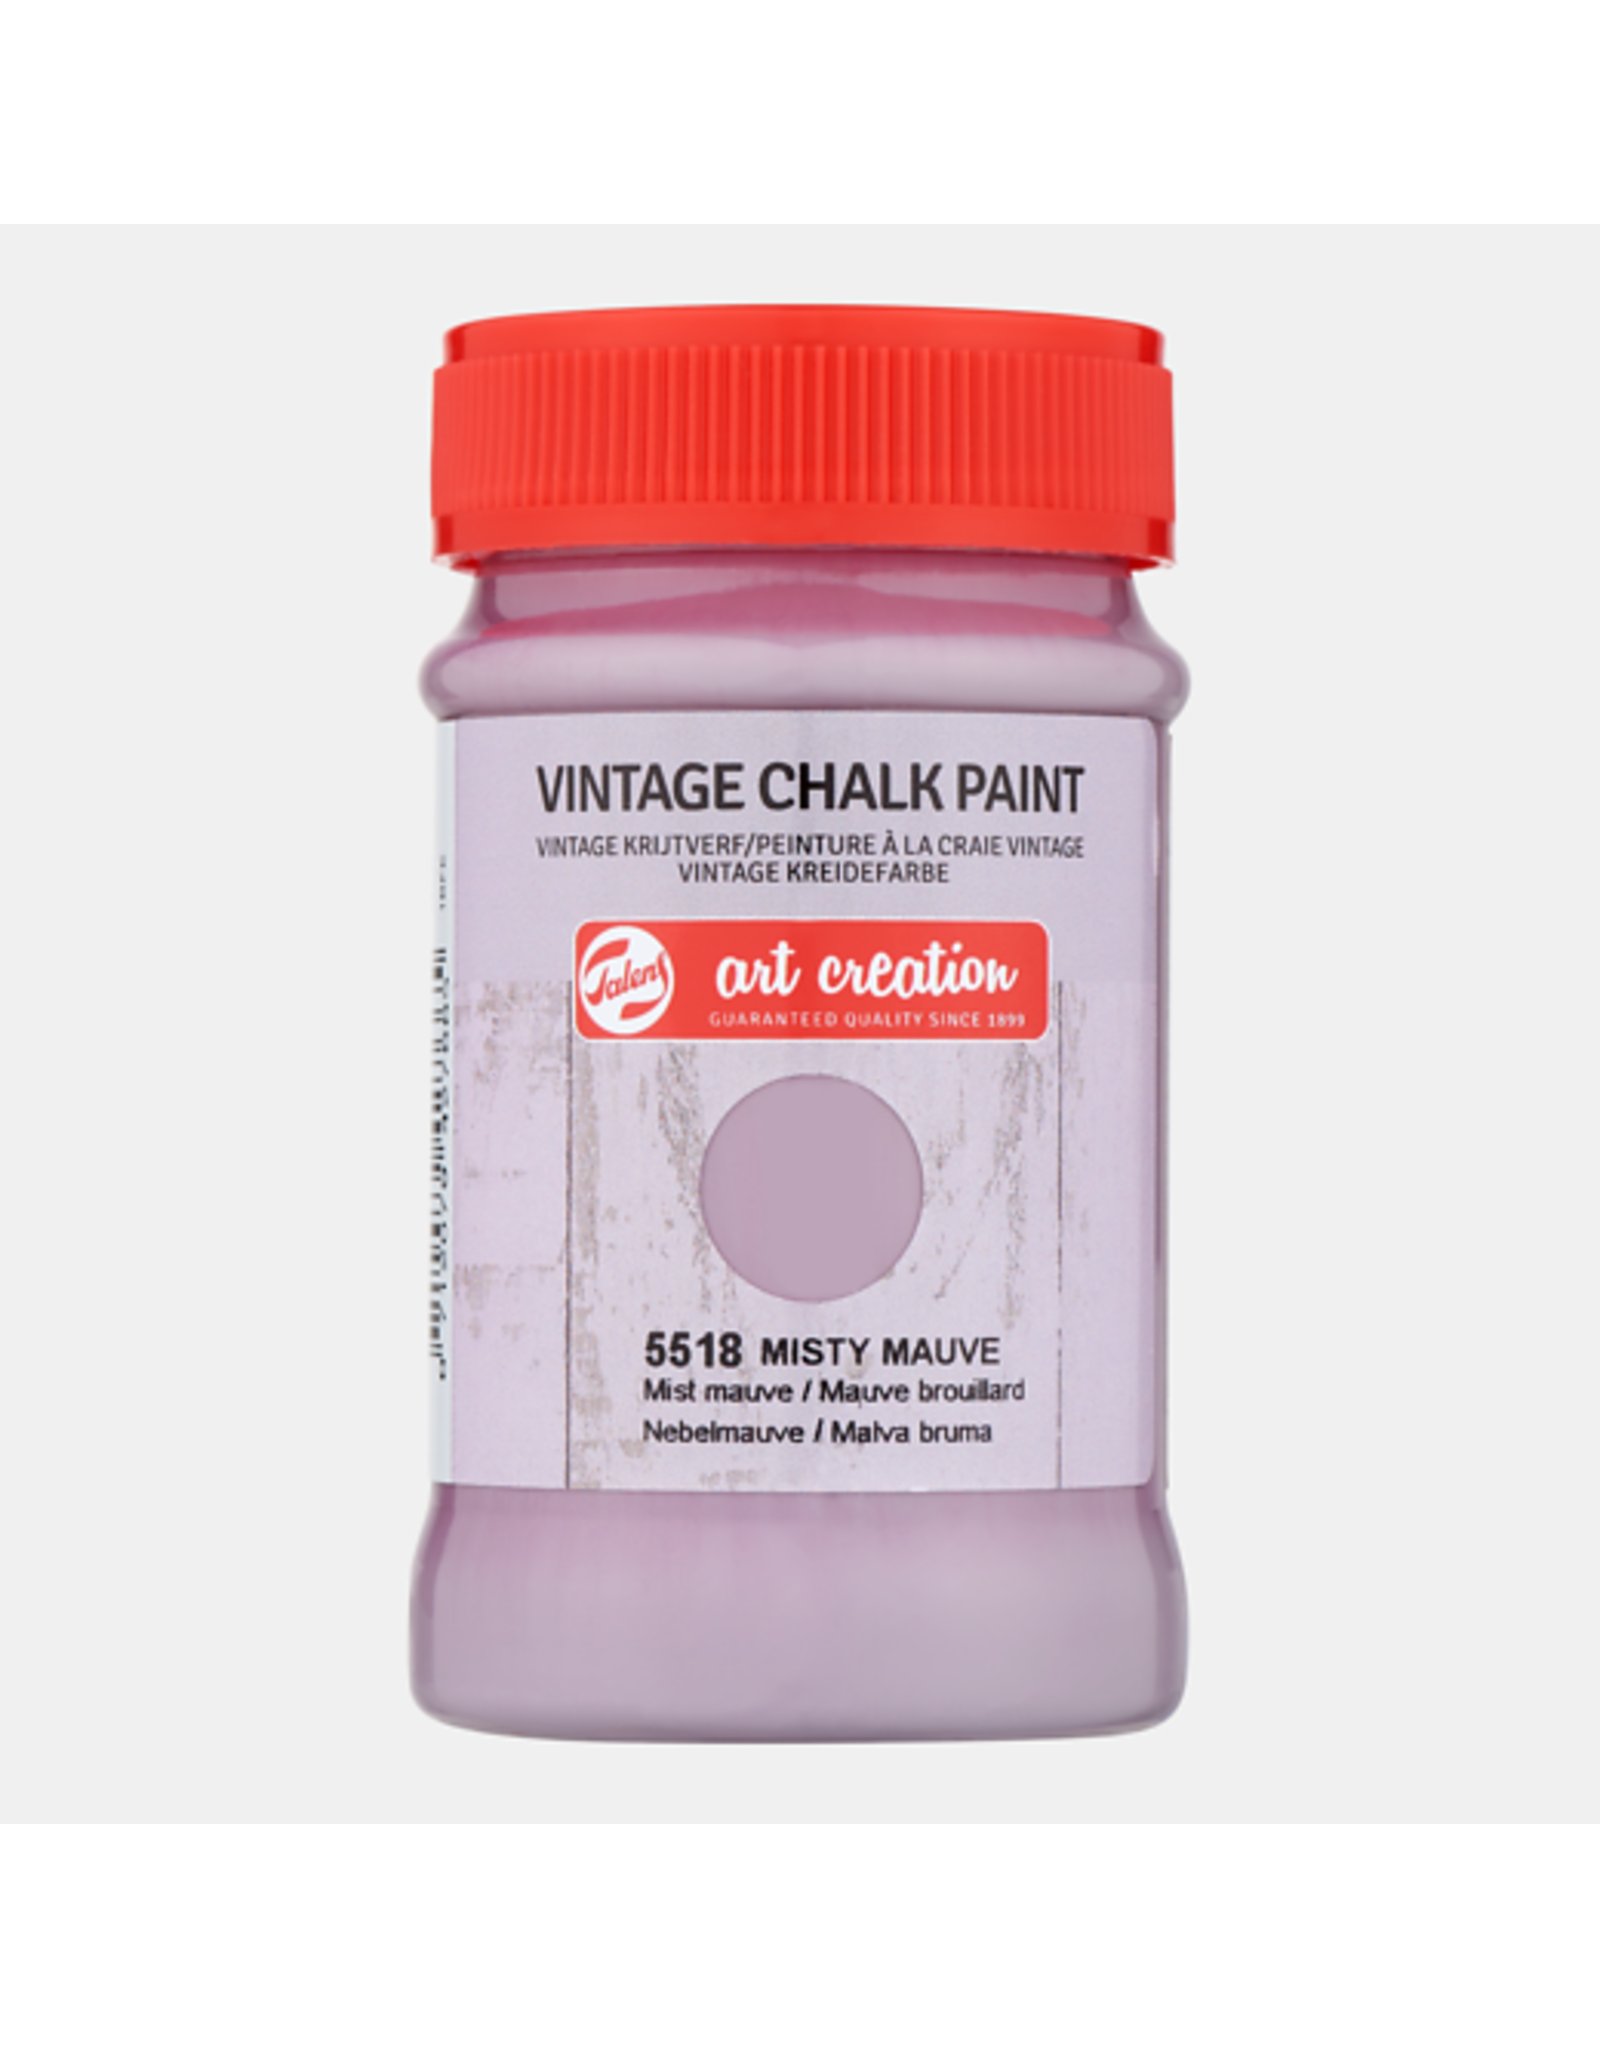 Art creation Mist mauve - Vintage Chalk Paint - 100 ml